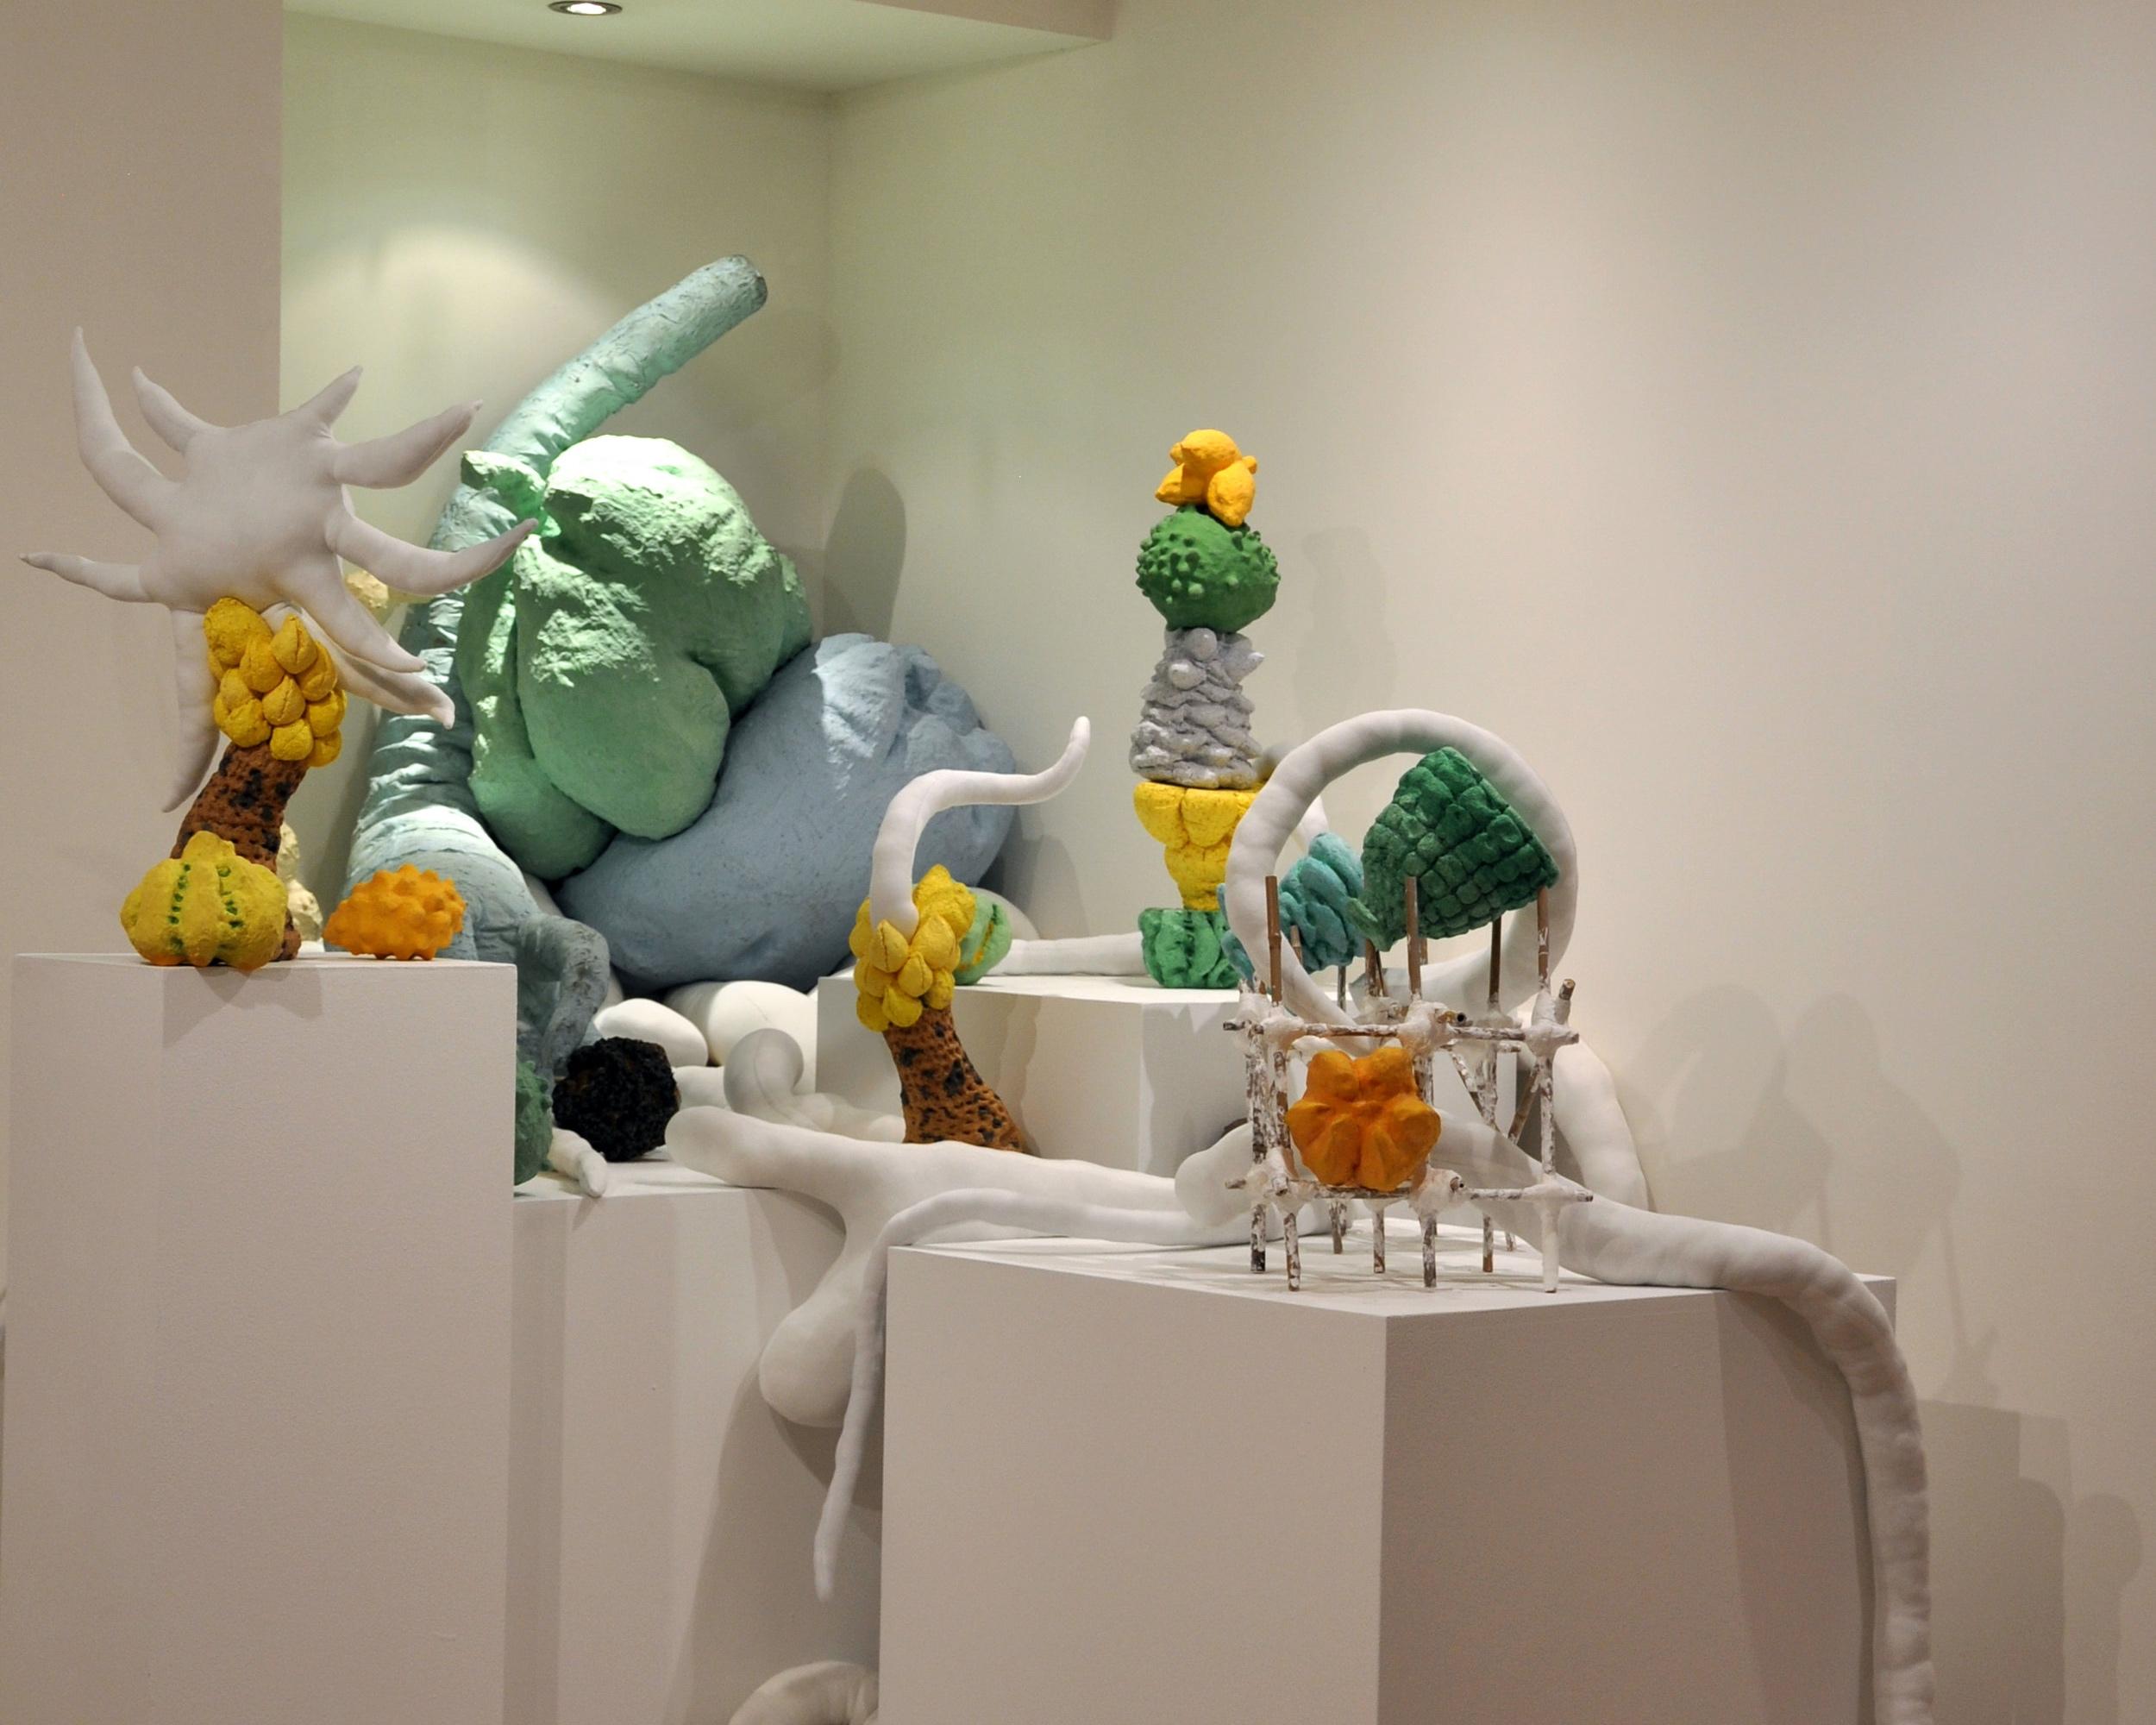 Elly+Thomas.Installation+at+Collyer+Bristow+Gallery.+Photos+courtesy+of++Michaela+Nettell.DSC_7598.jpg